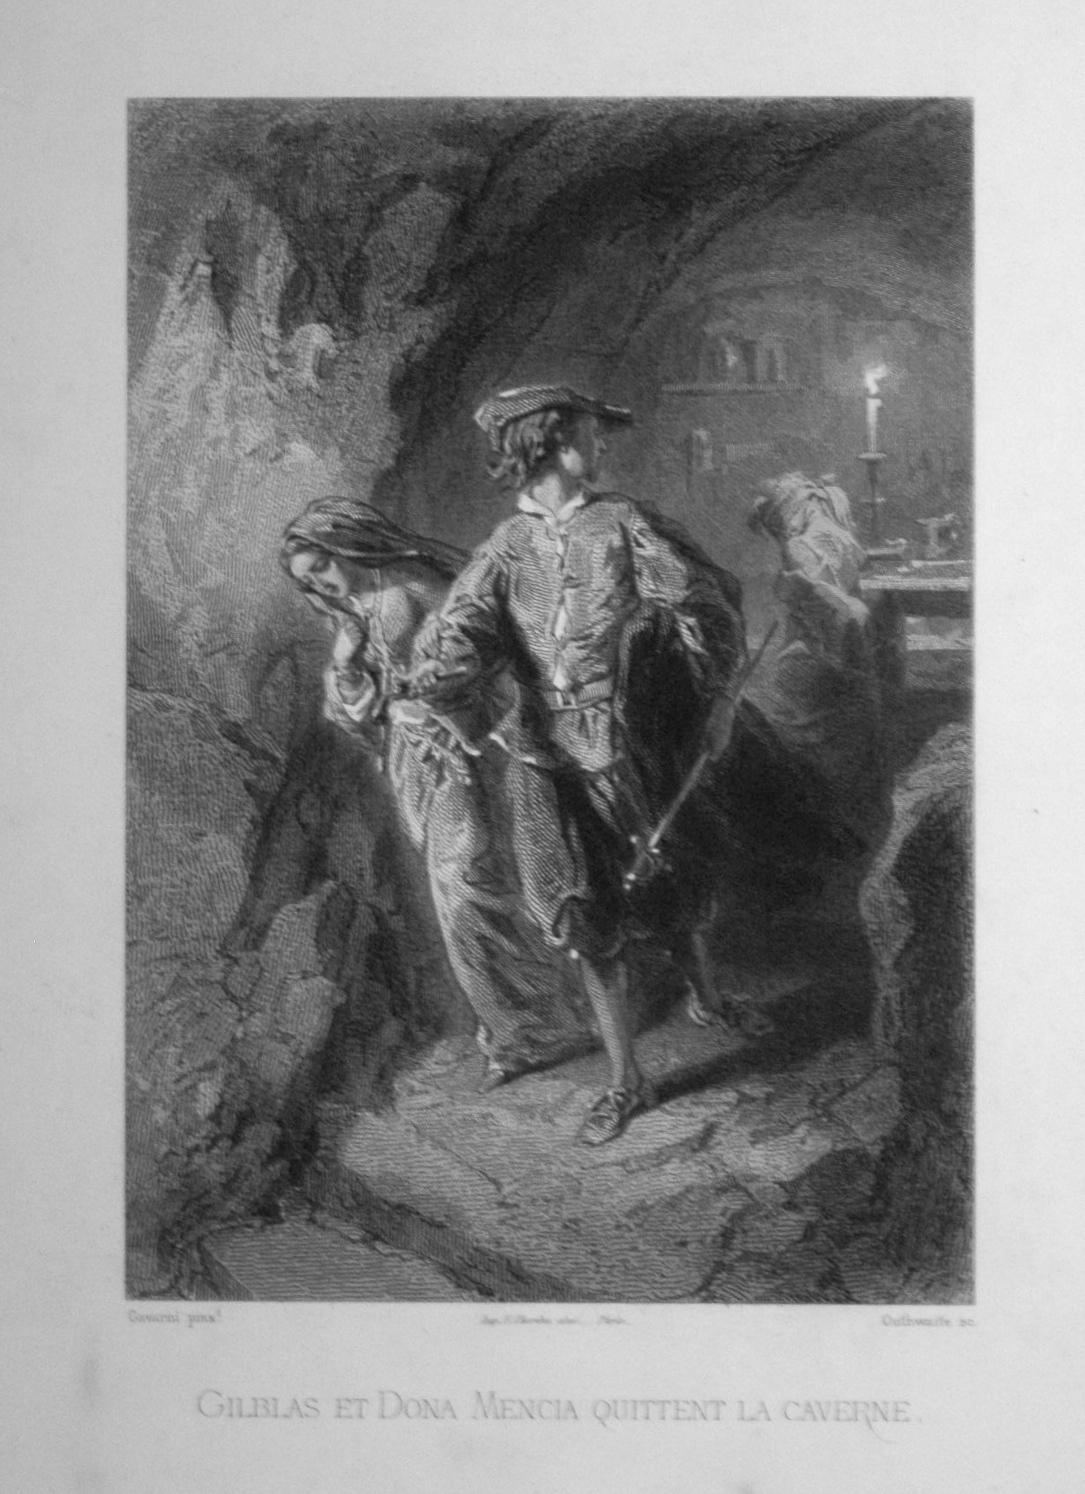 Gilblas et Dona Mencia quittent la caverne.